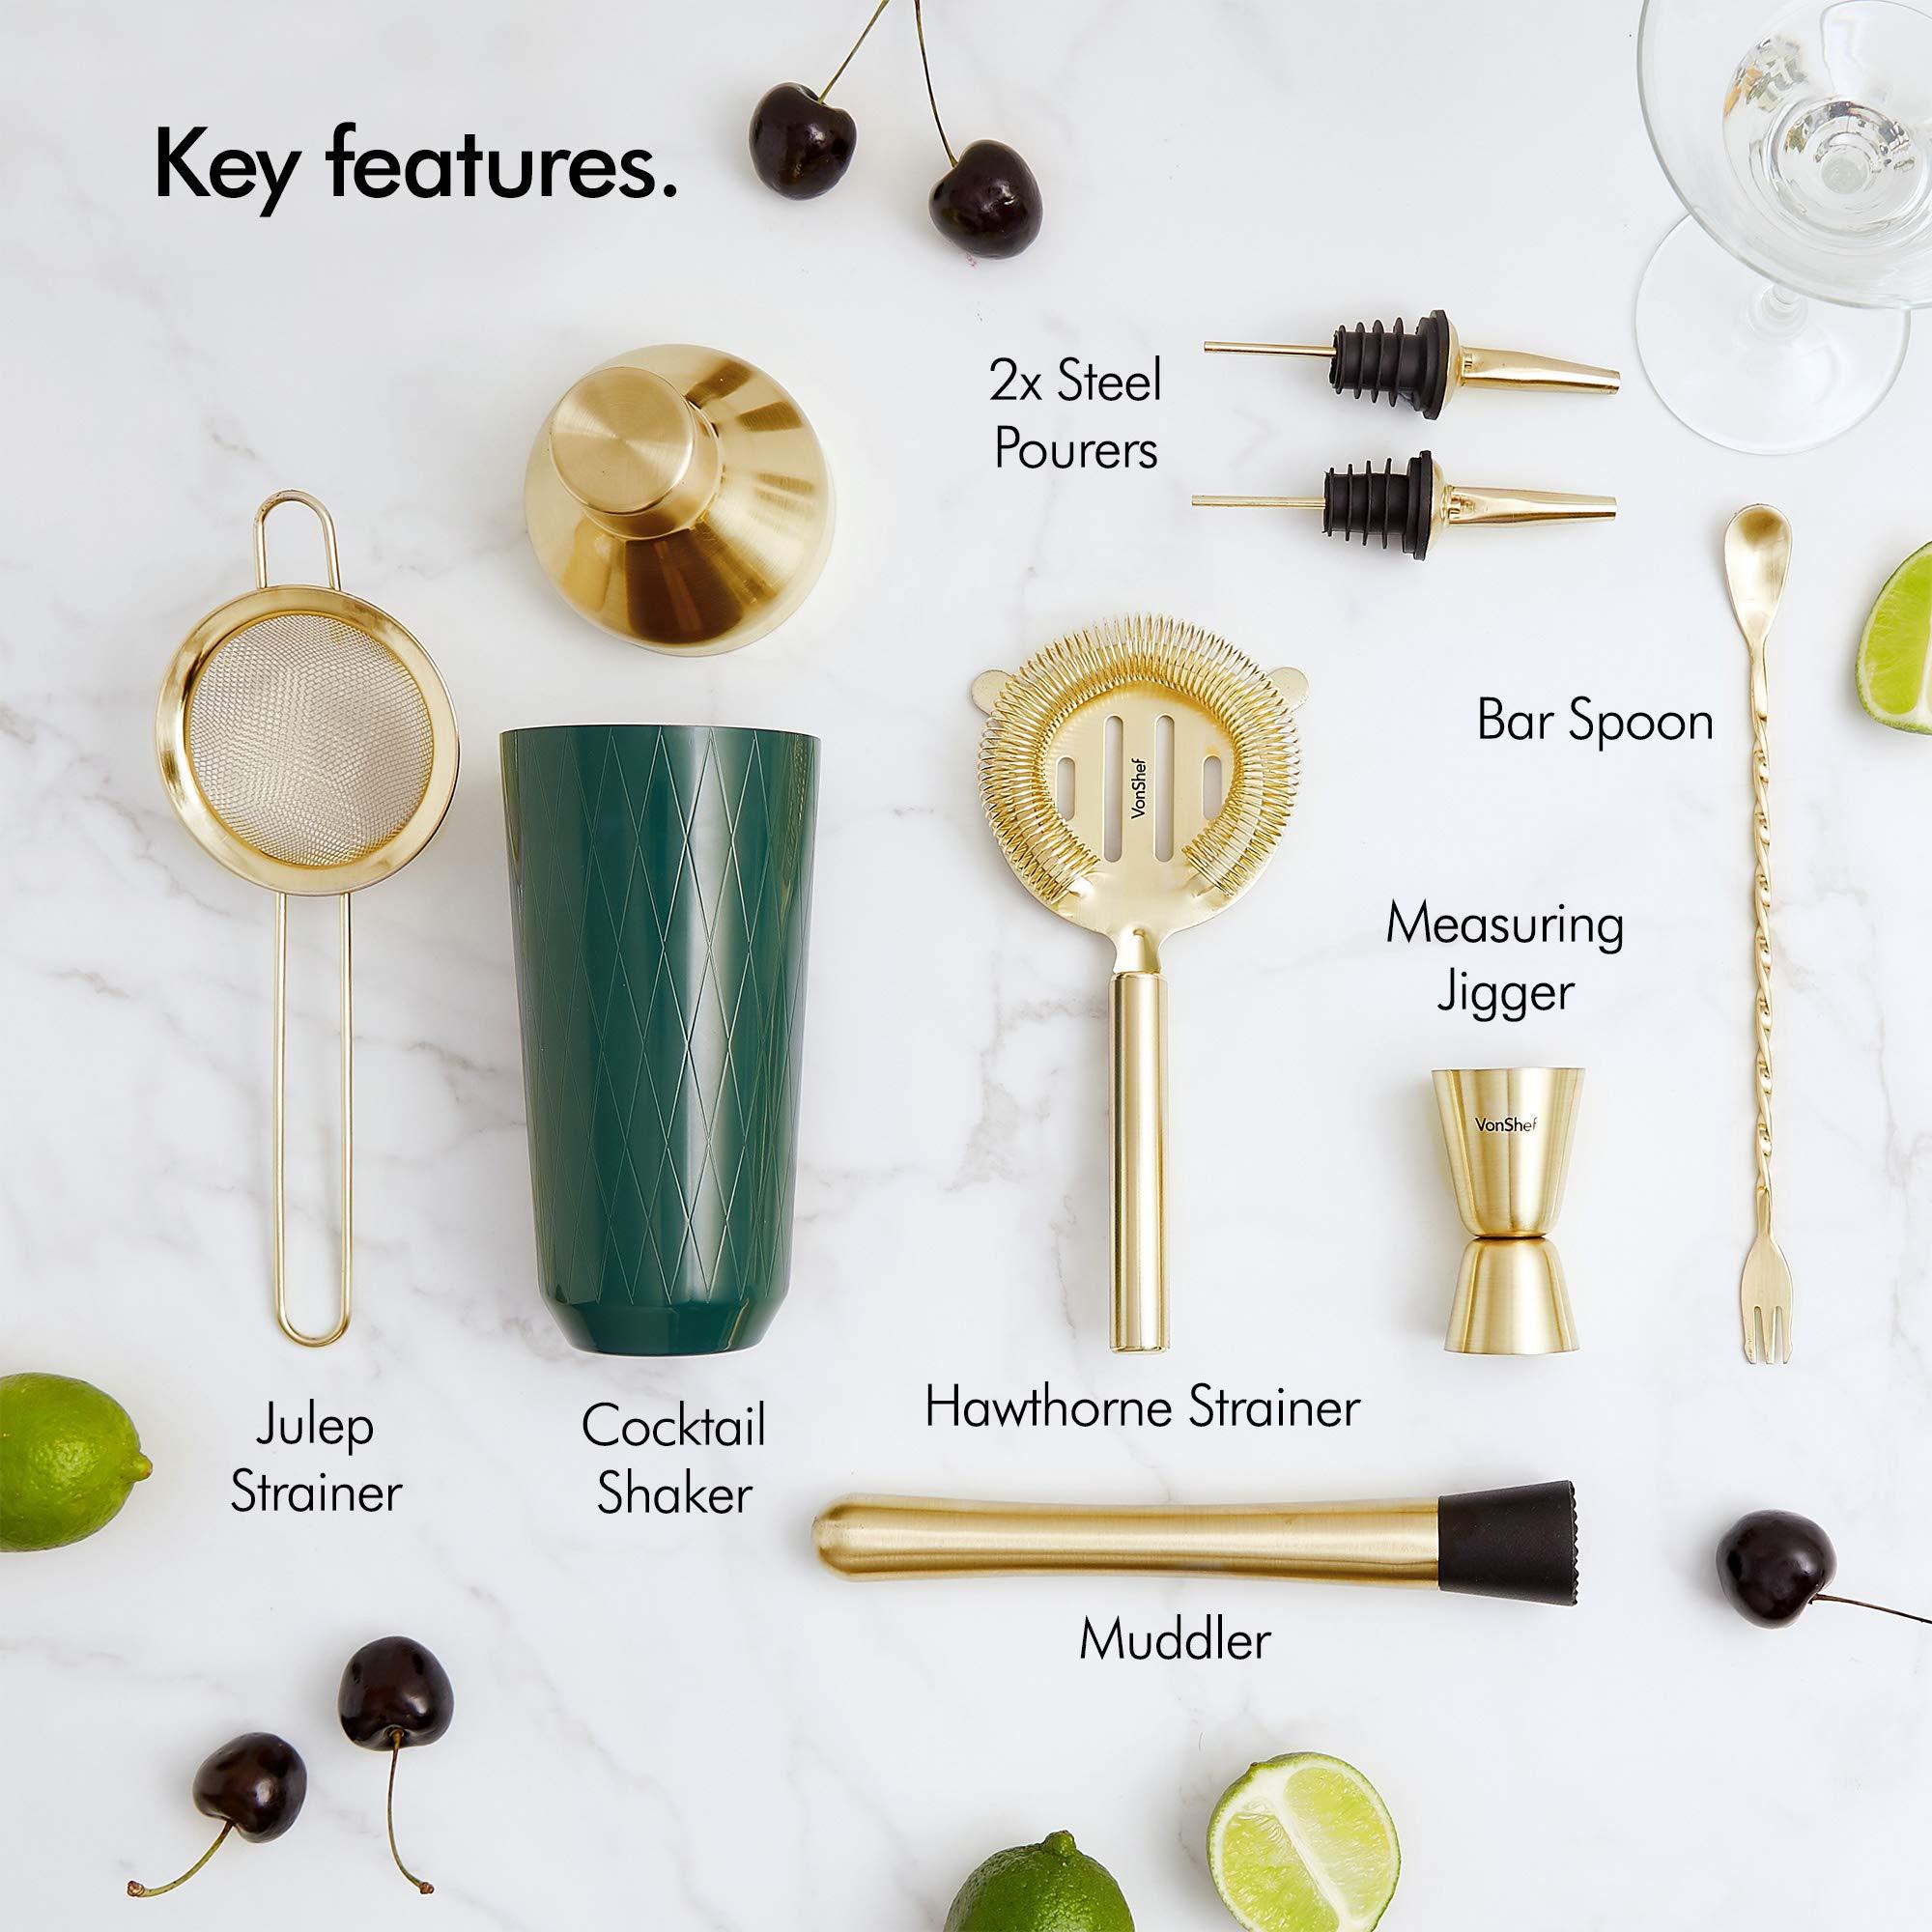 VonShef Green & Gold Cocktail Shaker Set in Gift Box with 16oz Shaker, Muddler, Bar Spoon, Jigger, Hawthorne Strainer, Julep Strainer, Bottle Pourer and Recipe Book by VonShef (Image #3)